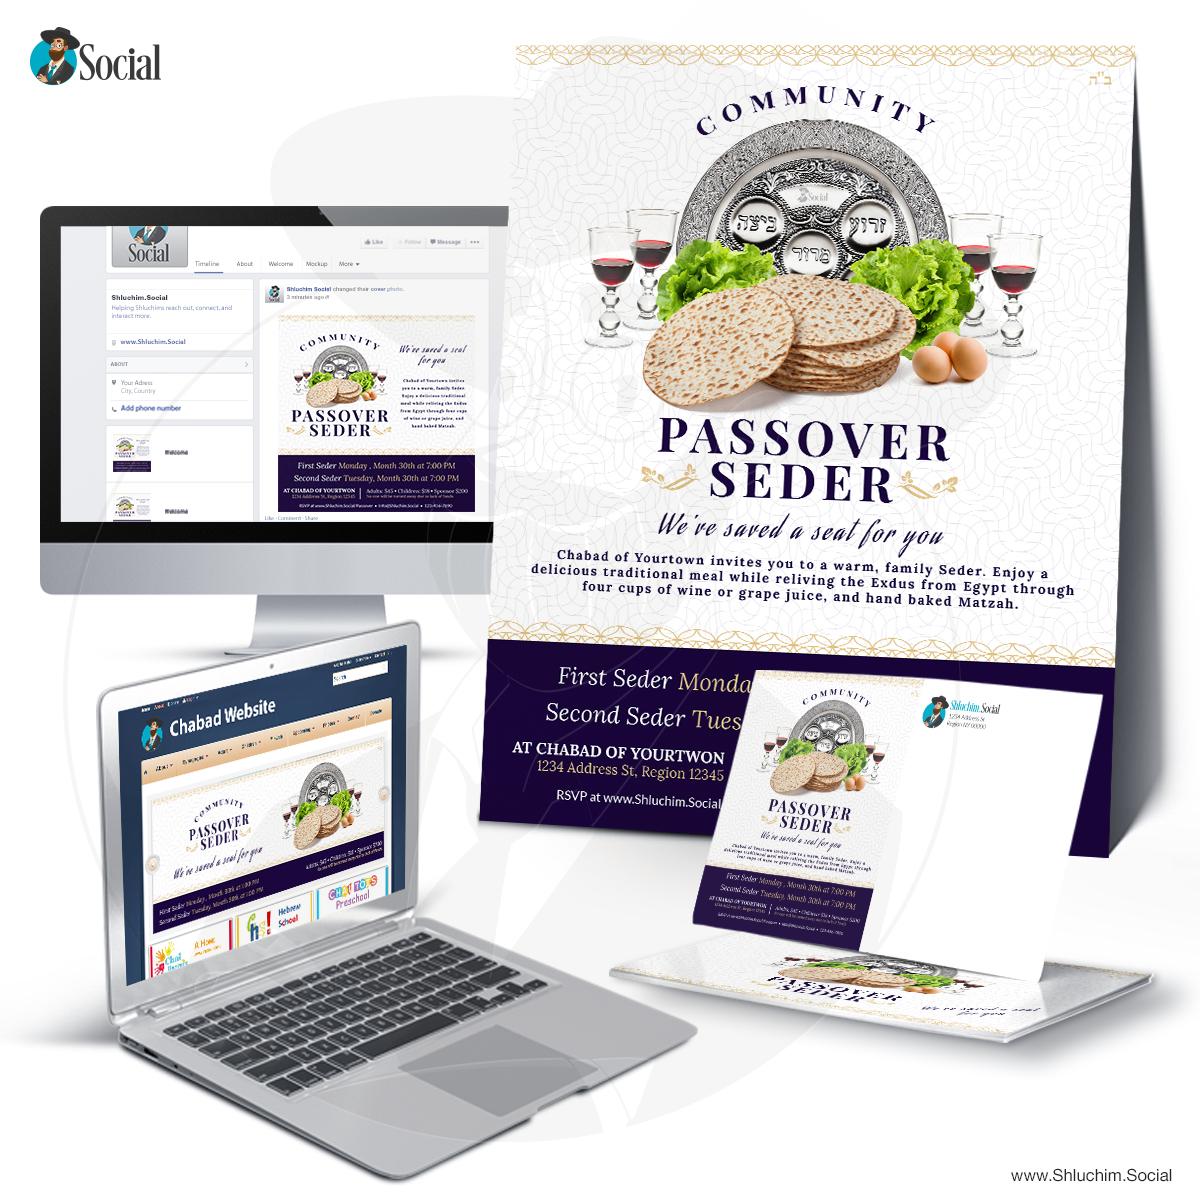 Decor Community Passover Seder